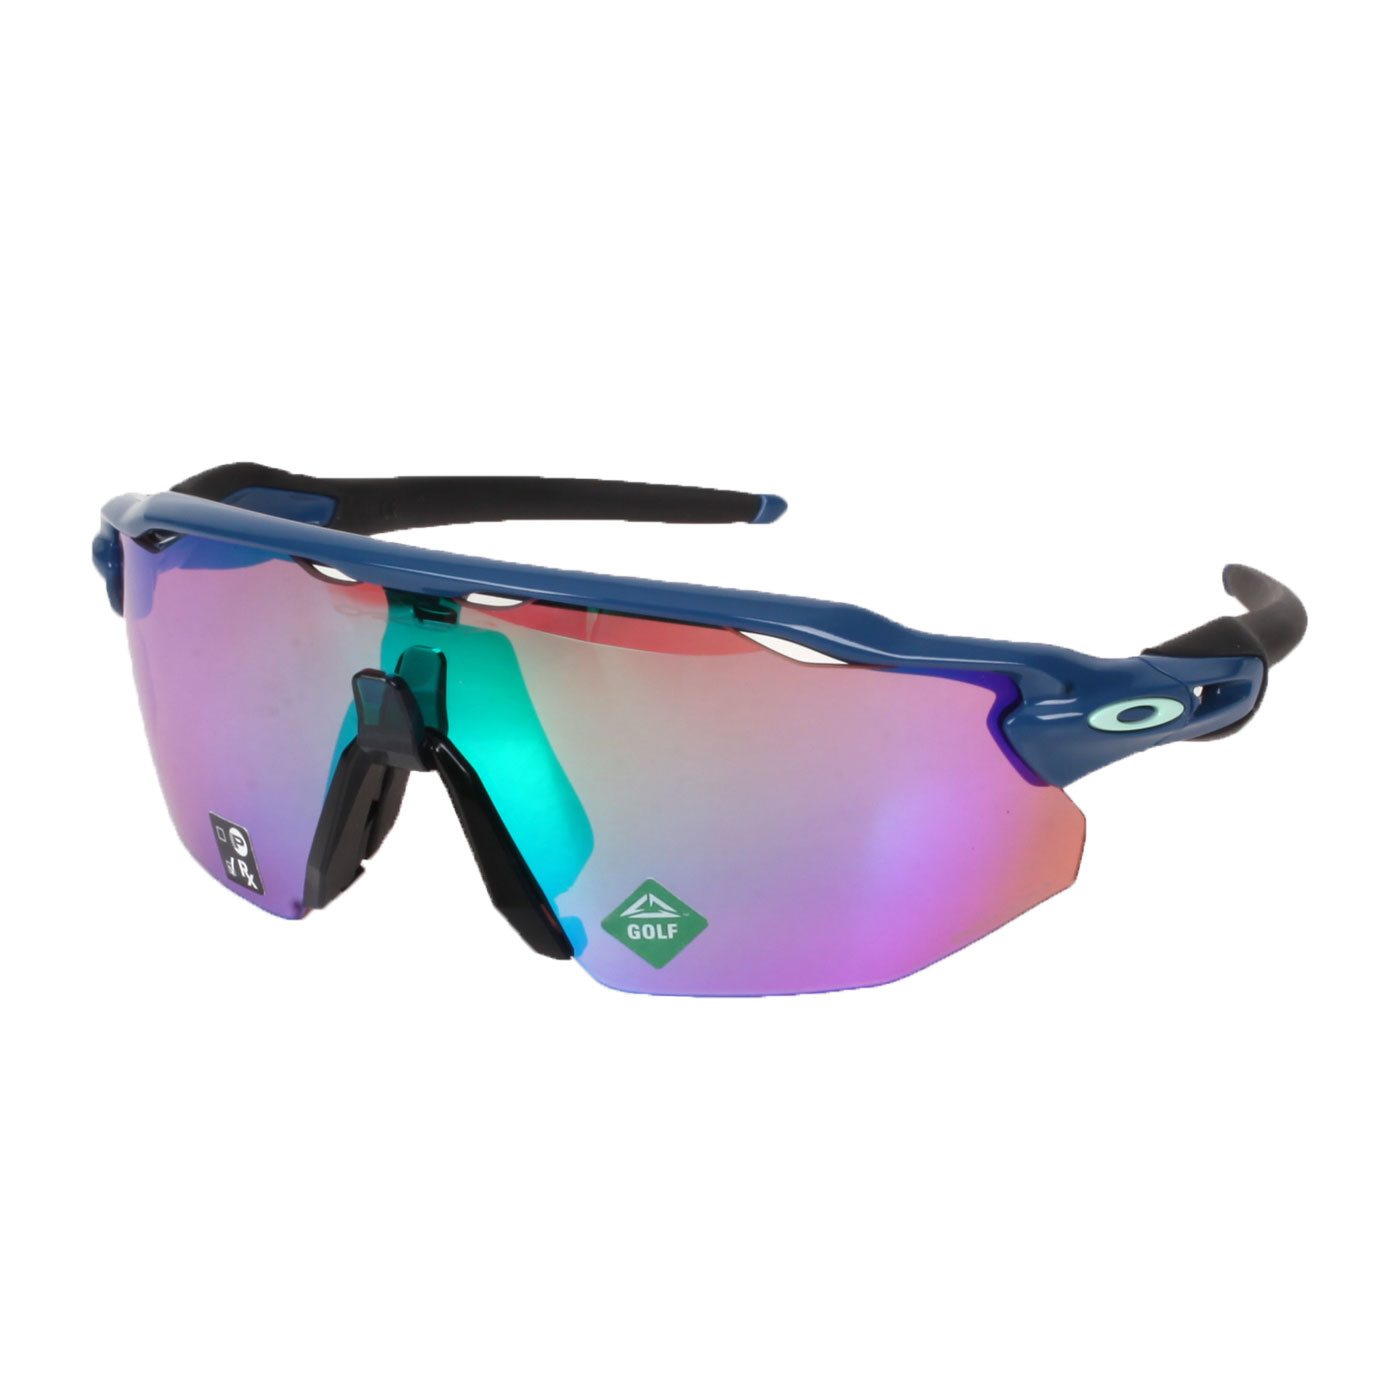 OAKLEY RADAR EV ADVANCER一般太陽眼鏡(附硬盒鼻墊) OAK-OO9442-0738